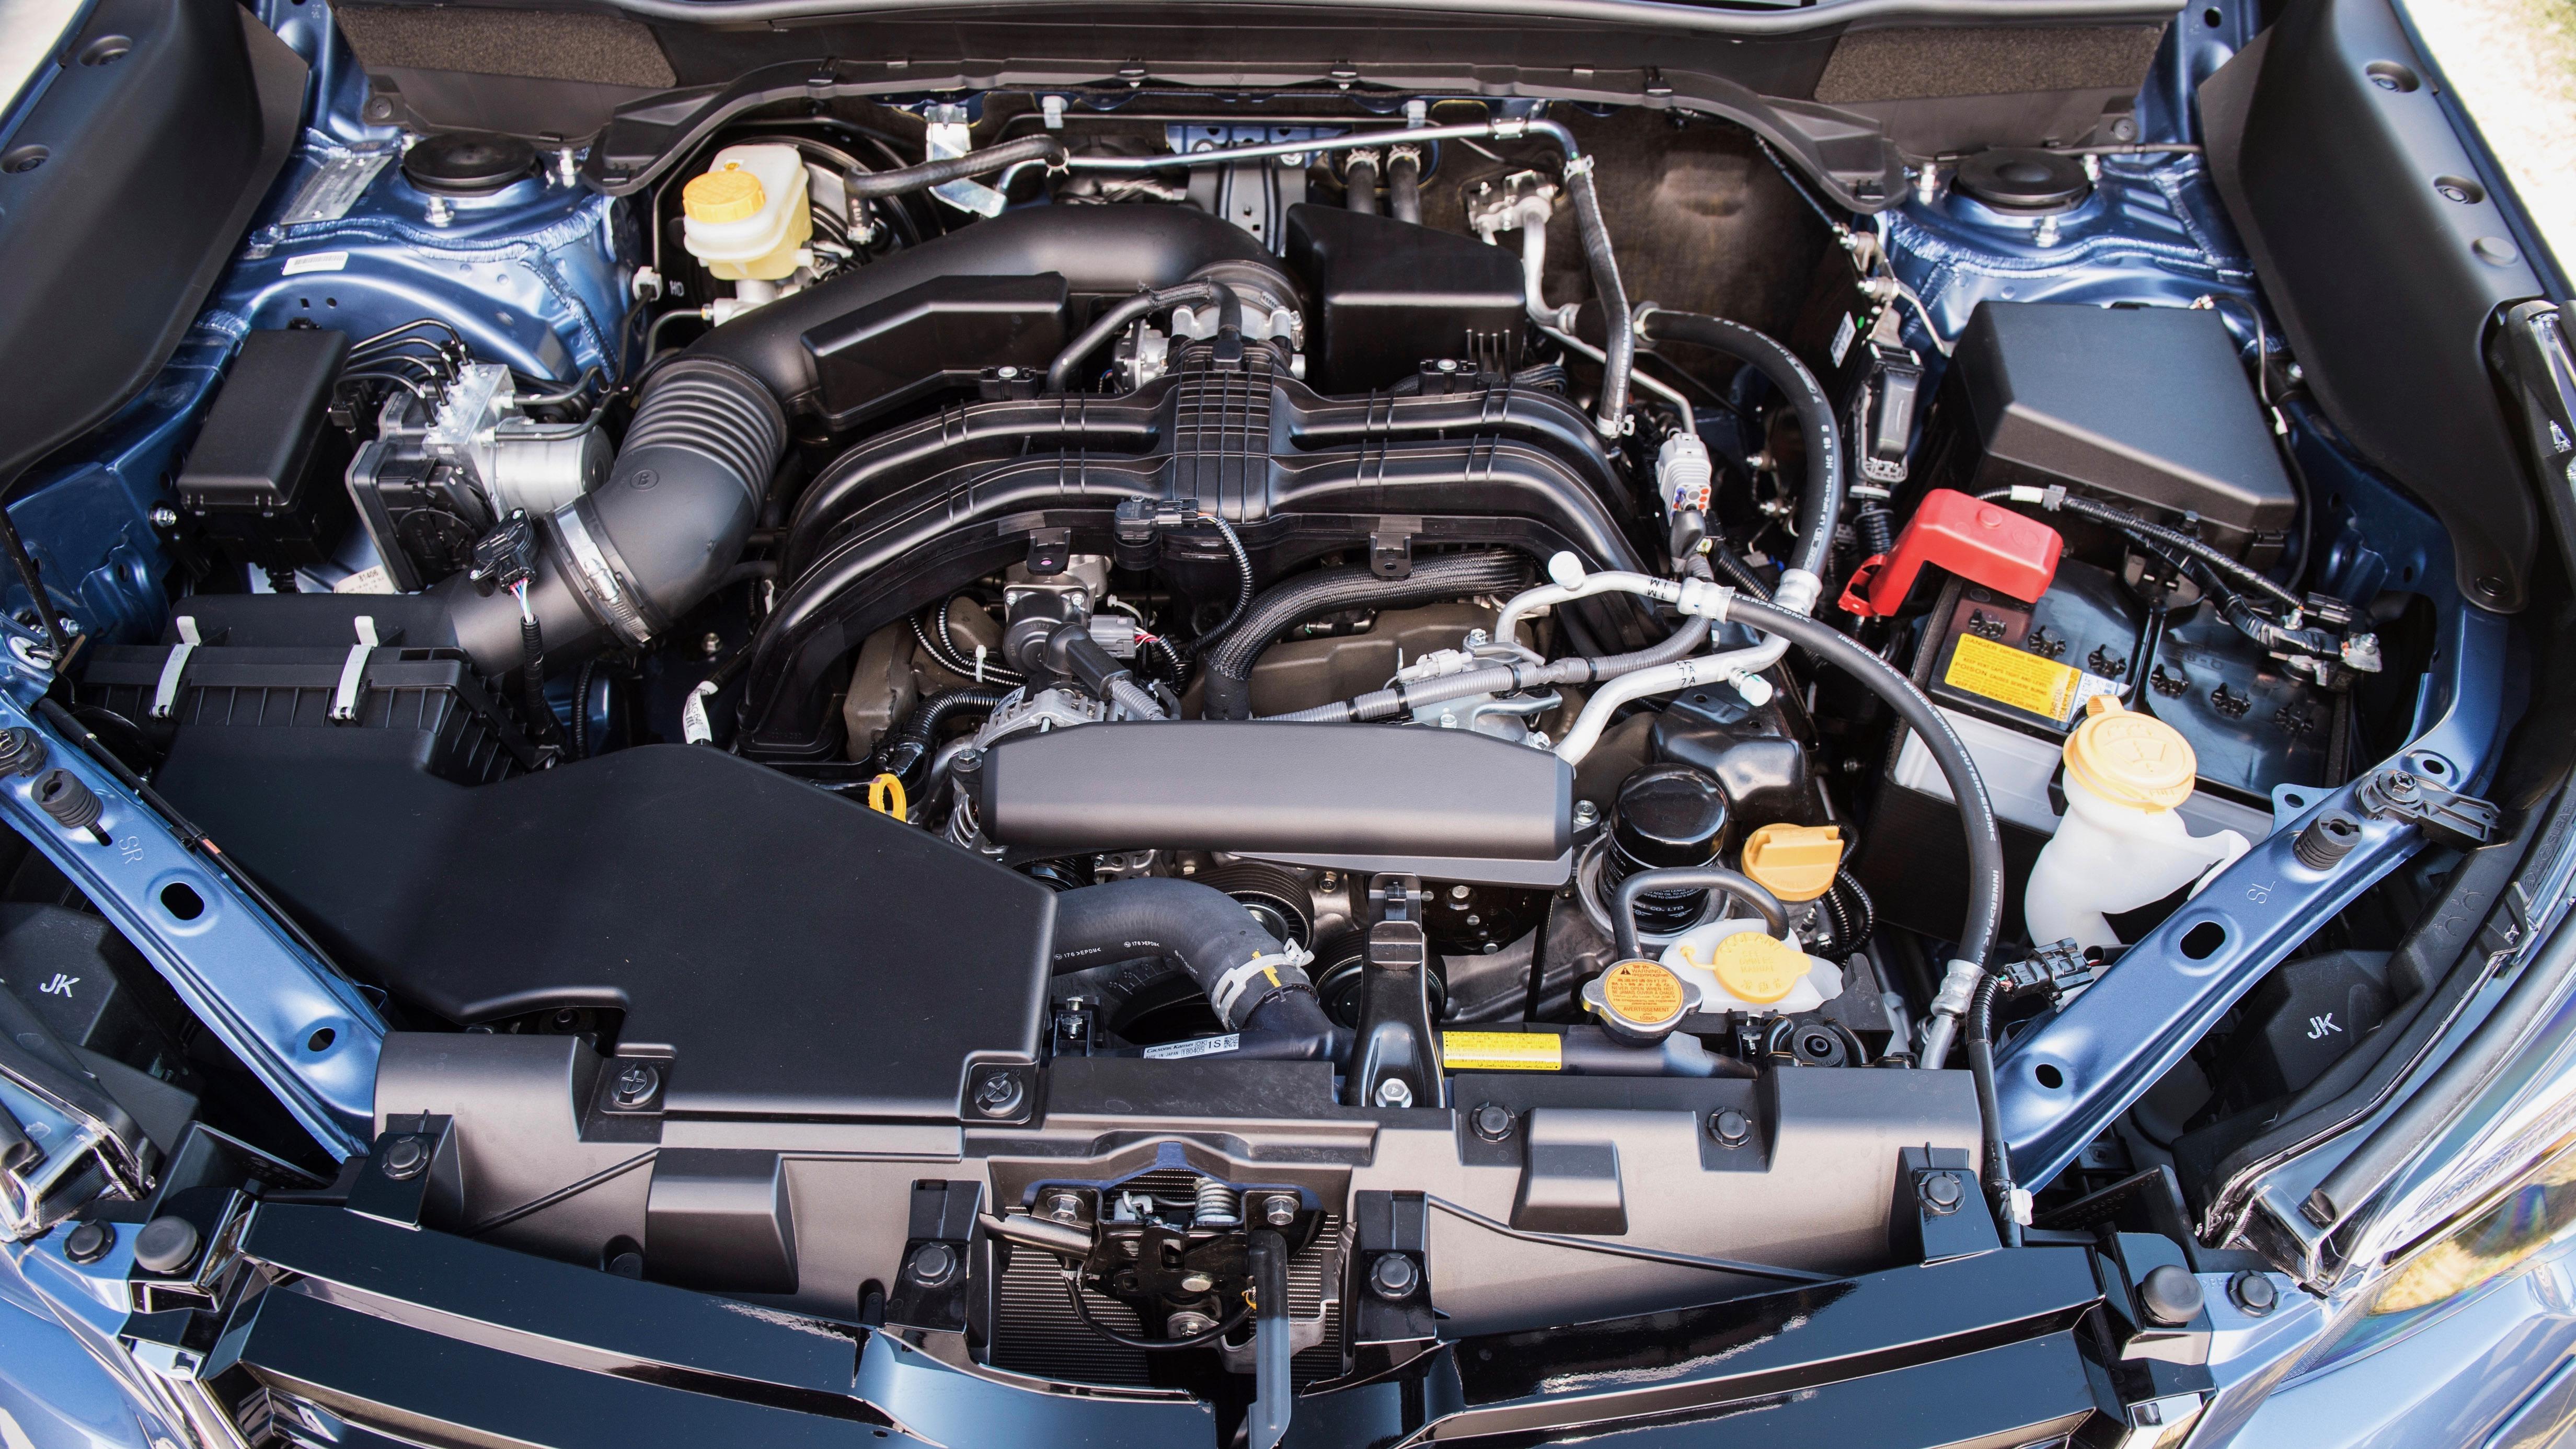 2019 Subaru Forester engine